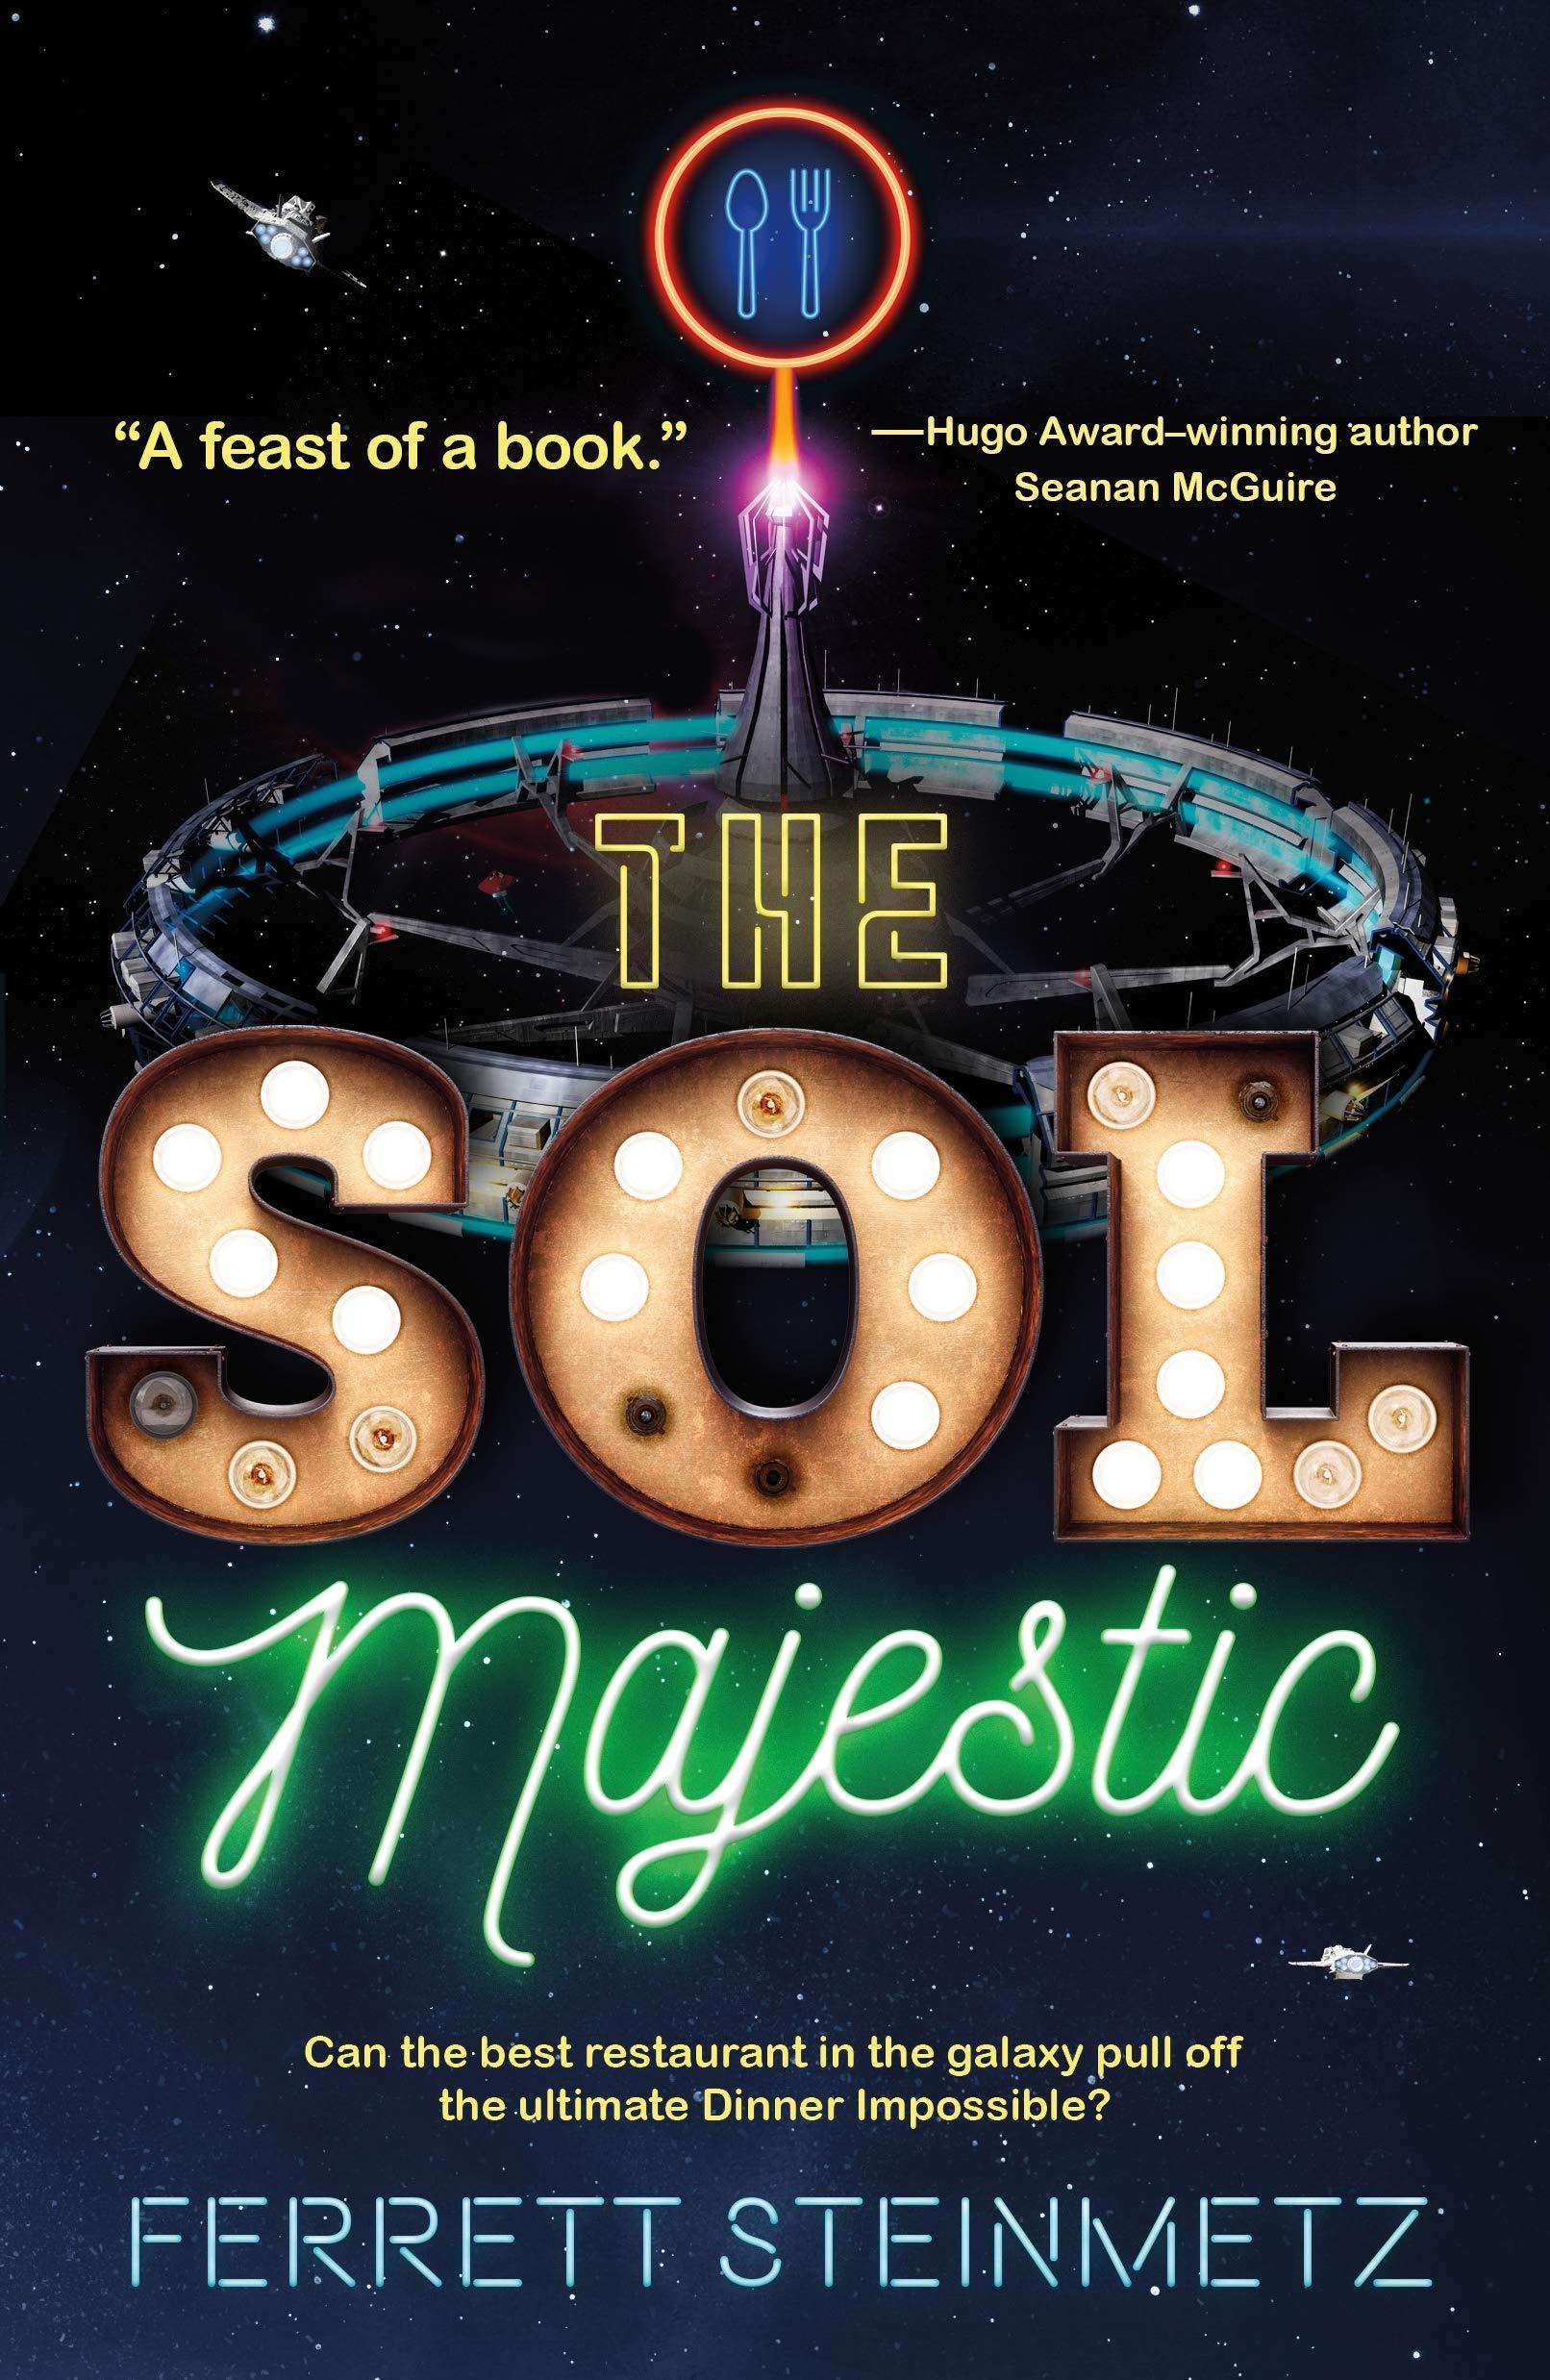 Ferrett Steinmetz: Five Things I Learned Writing The Sol Majestic